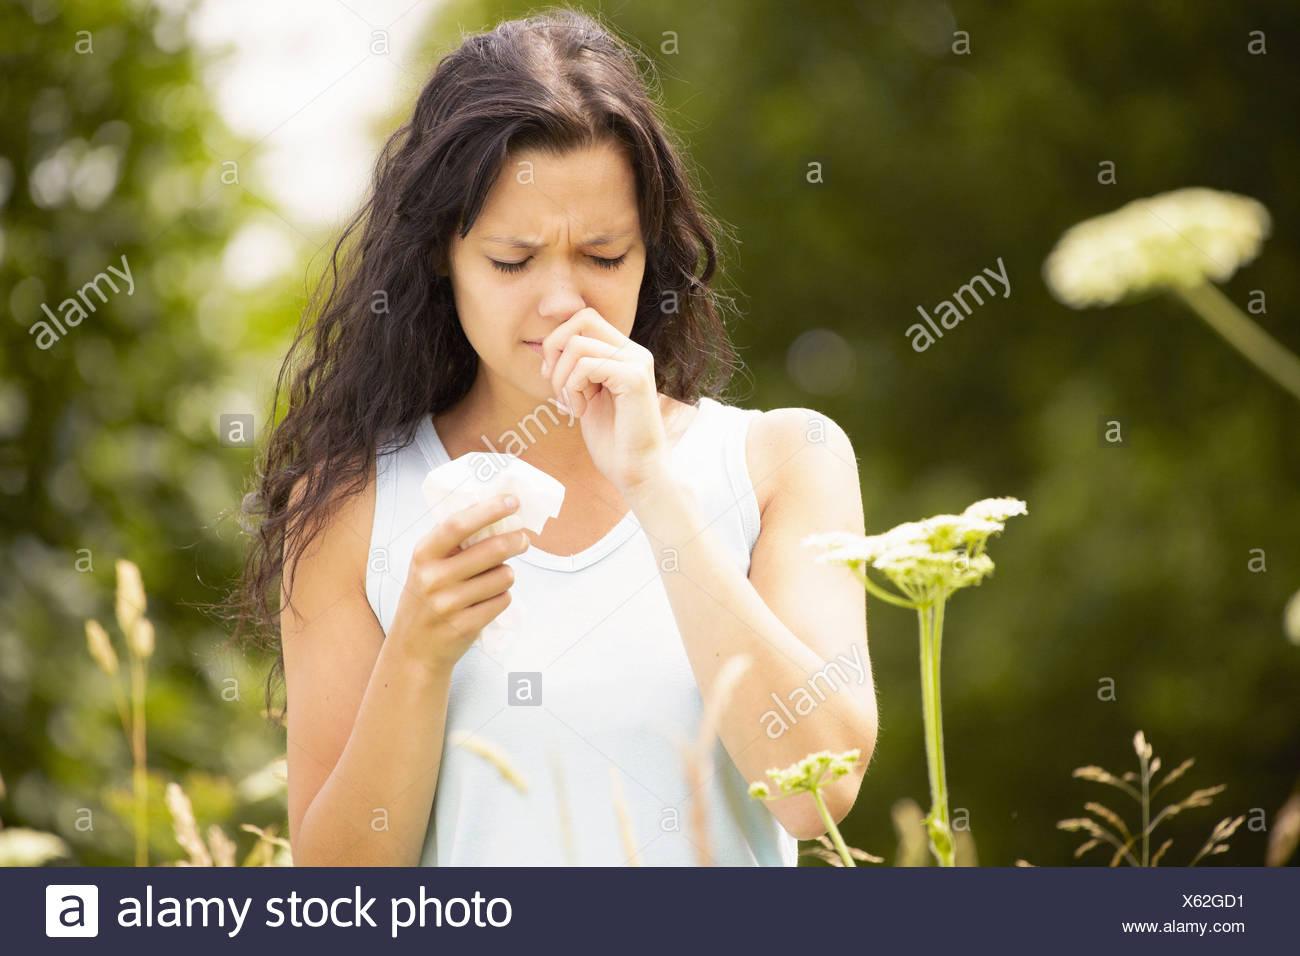 Fille avec nez frottant tissu Photo Stock